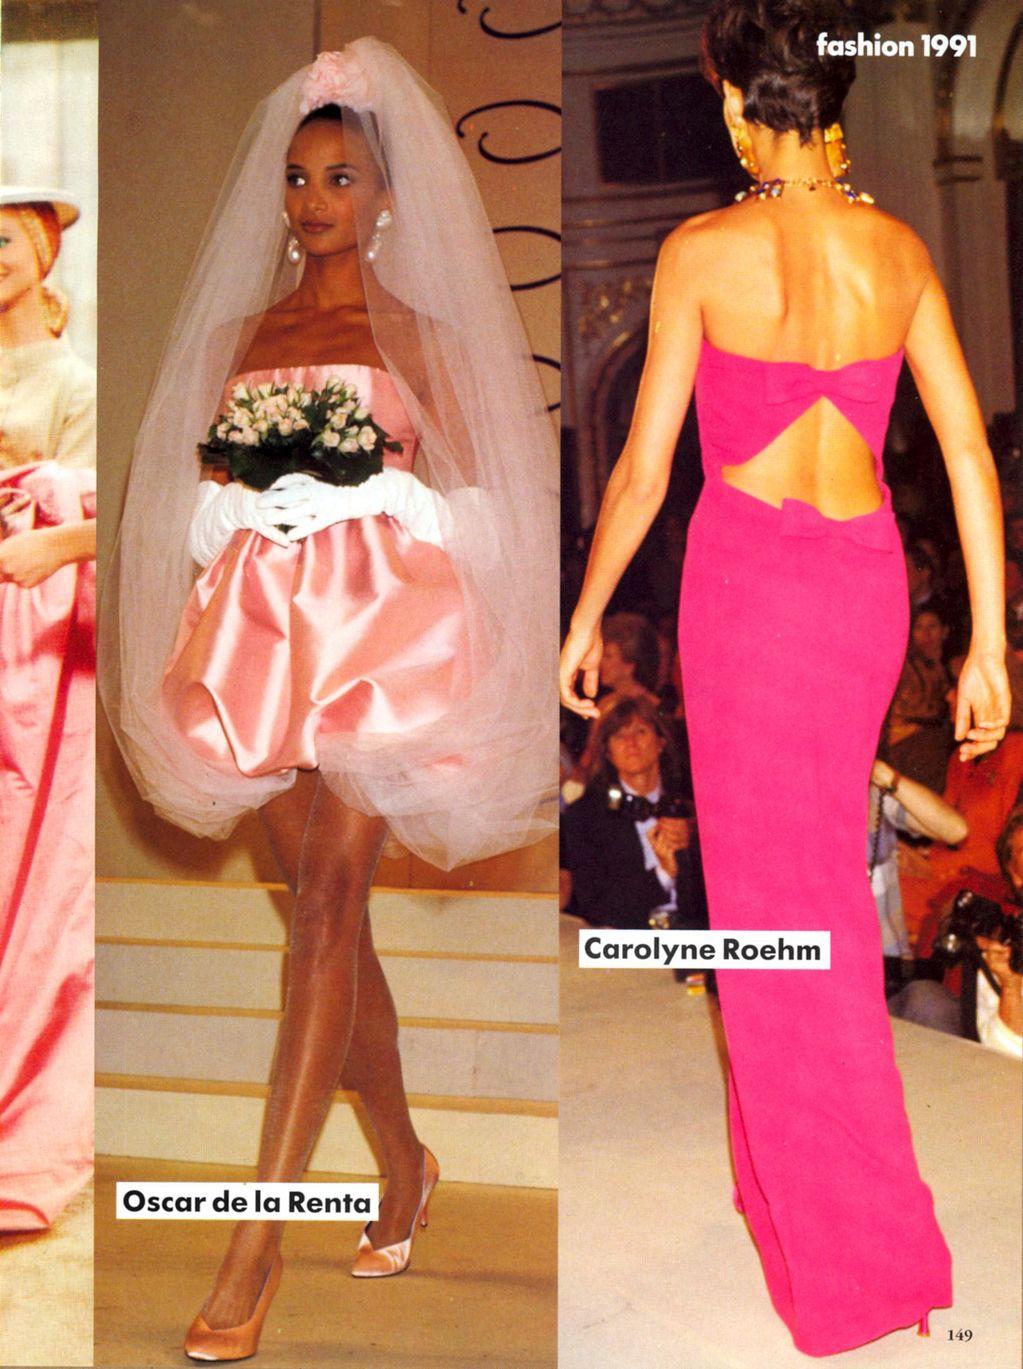 Vogue (US) January 1991 | Fashion 1991 18.jpg